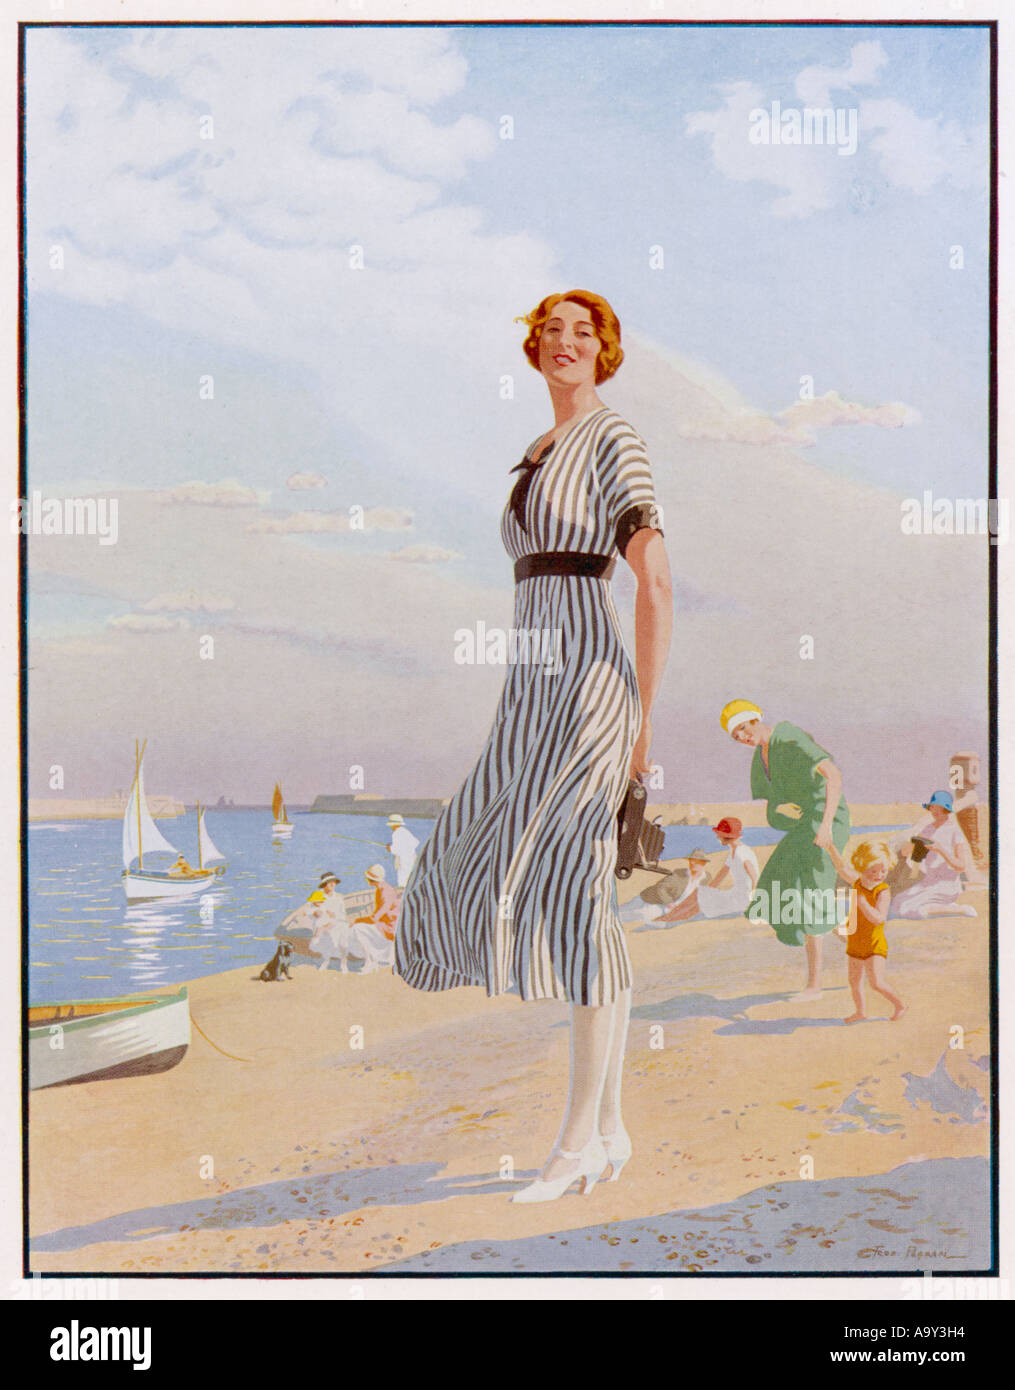 Advert Kodak Girl 1920s Stock Photo